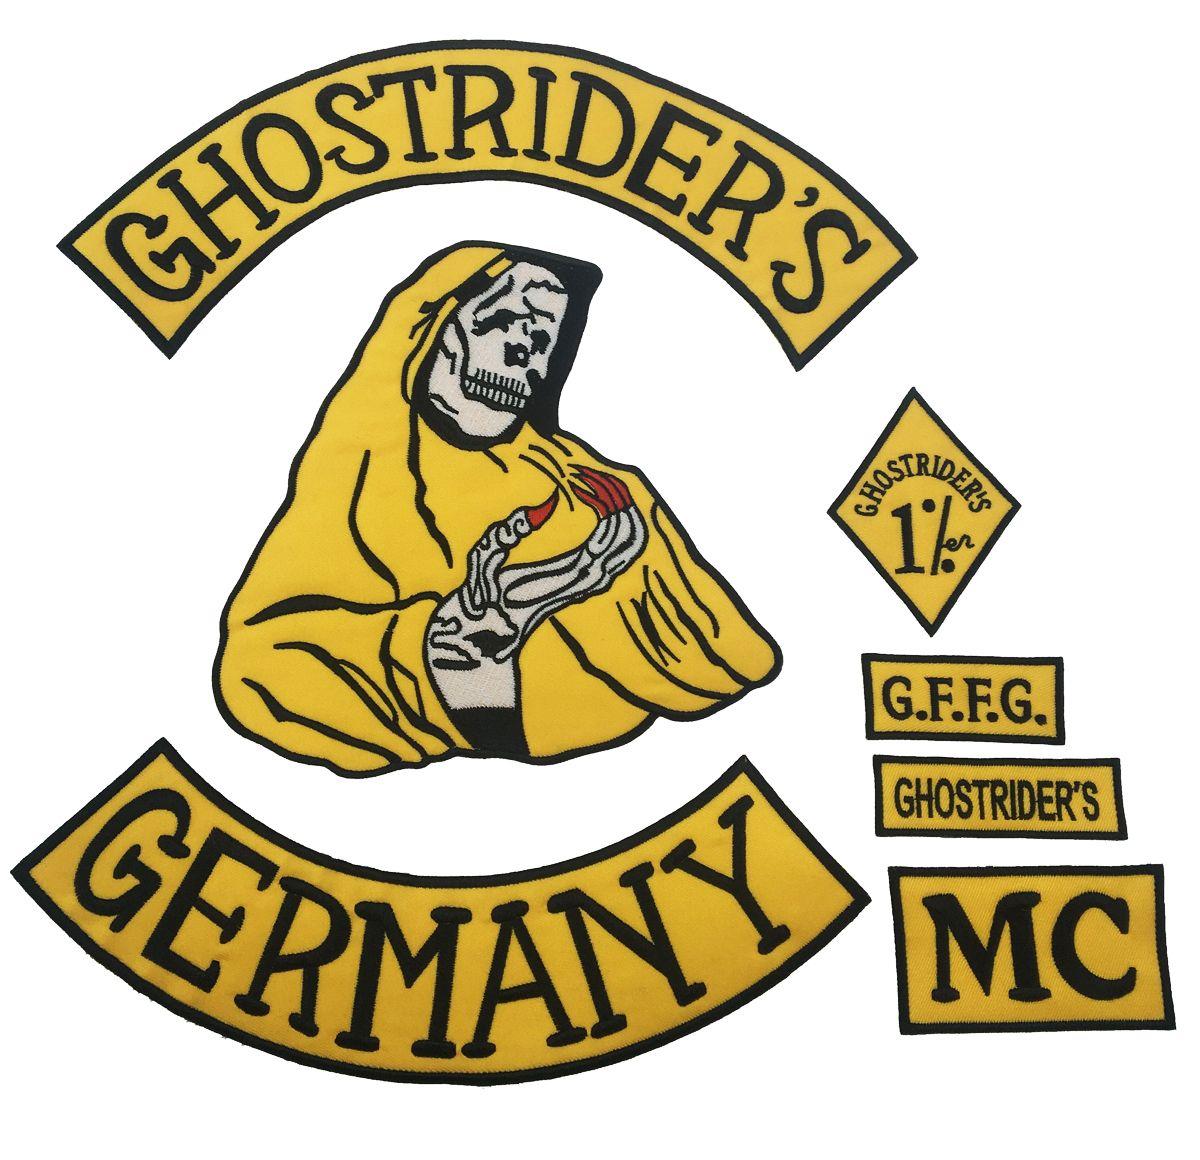 Nuovo Arrivo 7 pz / set GHOSTRIDER'S GERMANIA Ricamato Iron-On Sew On Back Patch Biker Rider Patch Per Jacket Vest Patch Spedizione Gratuita